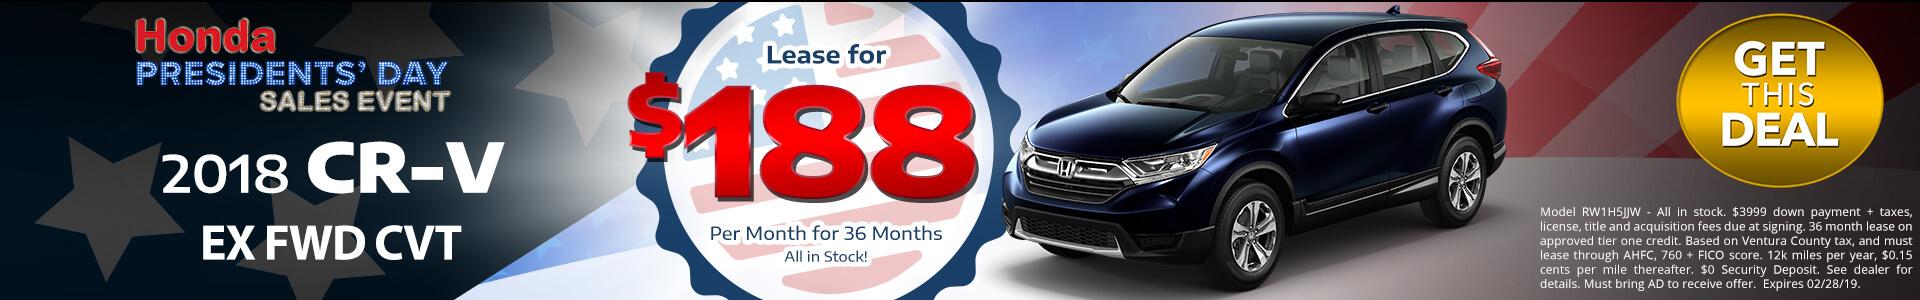 Honda CRV $188 Lease